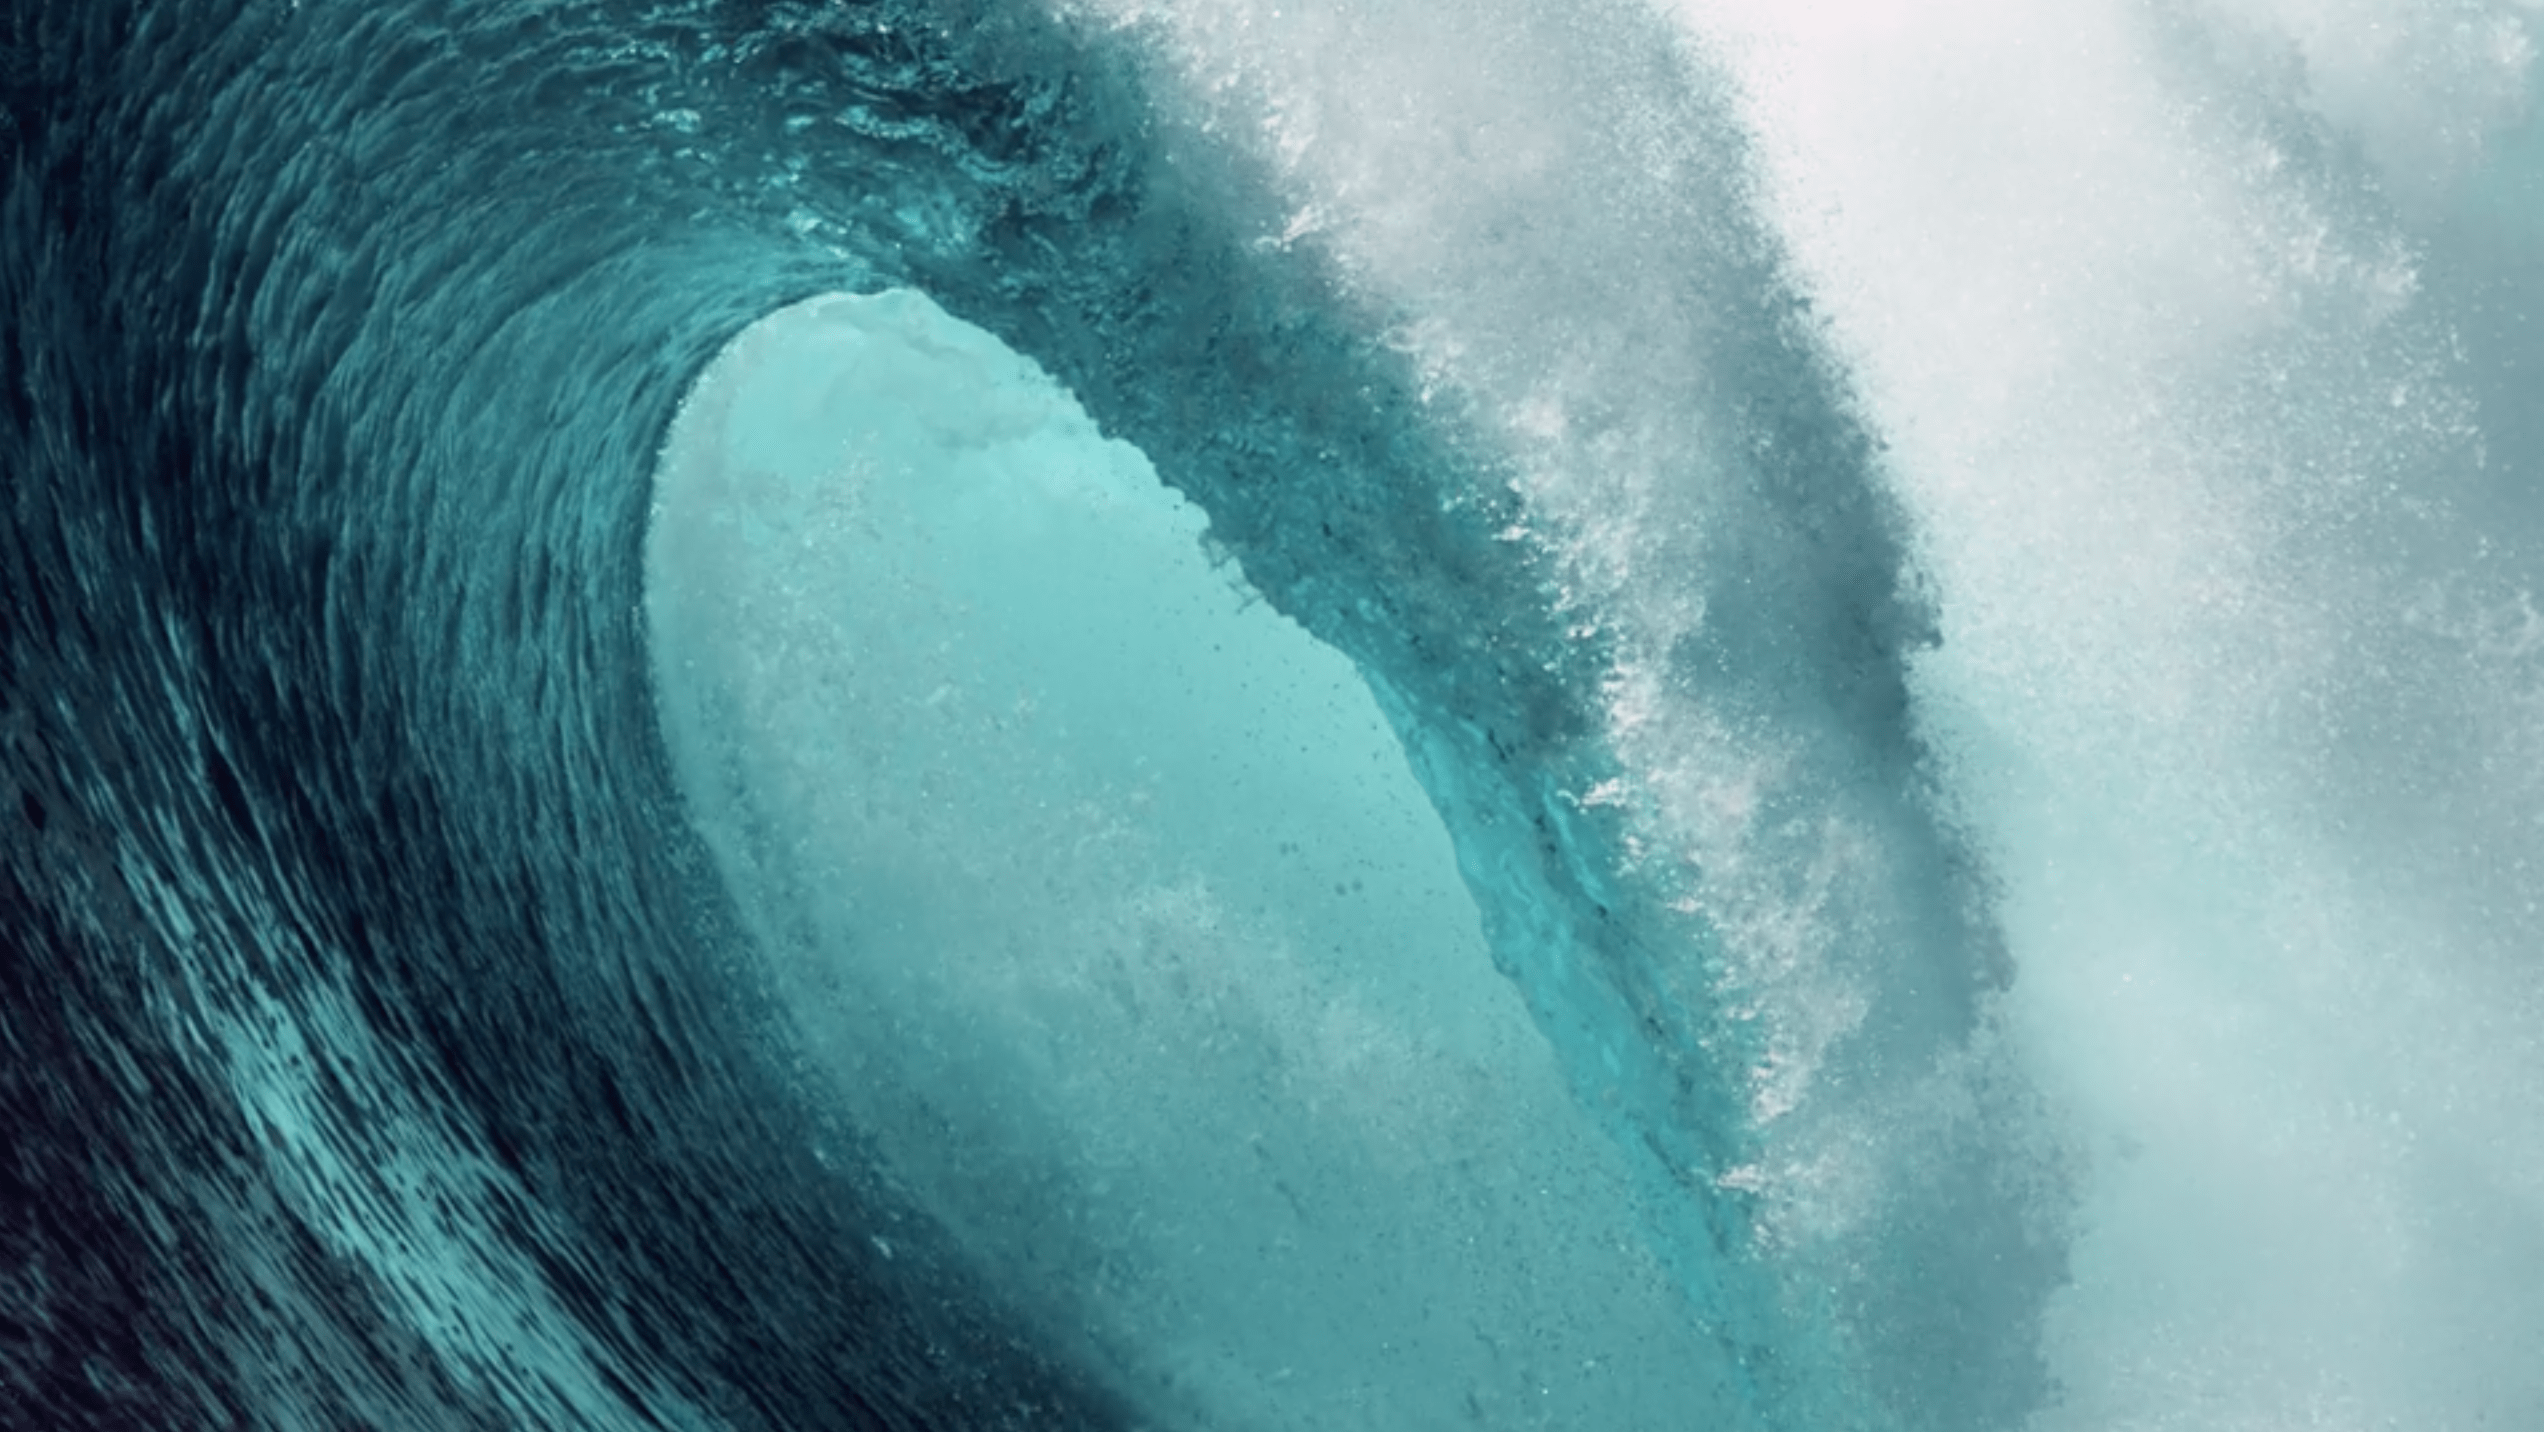 CGI Barrel wave image